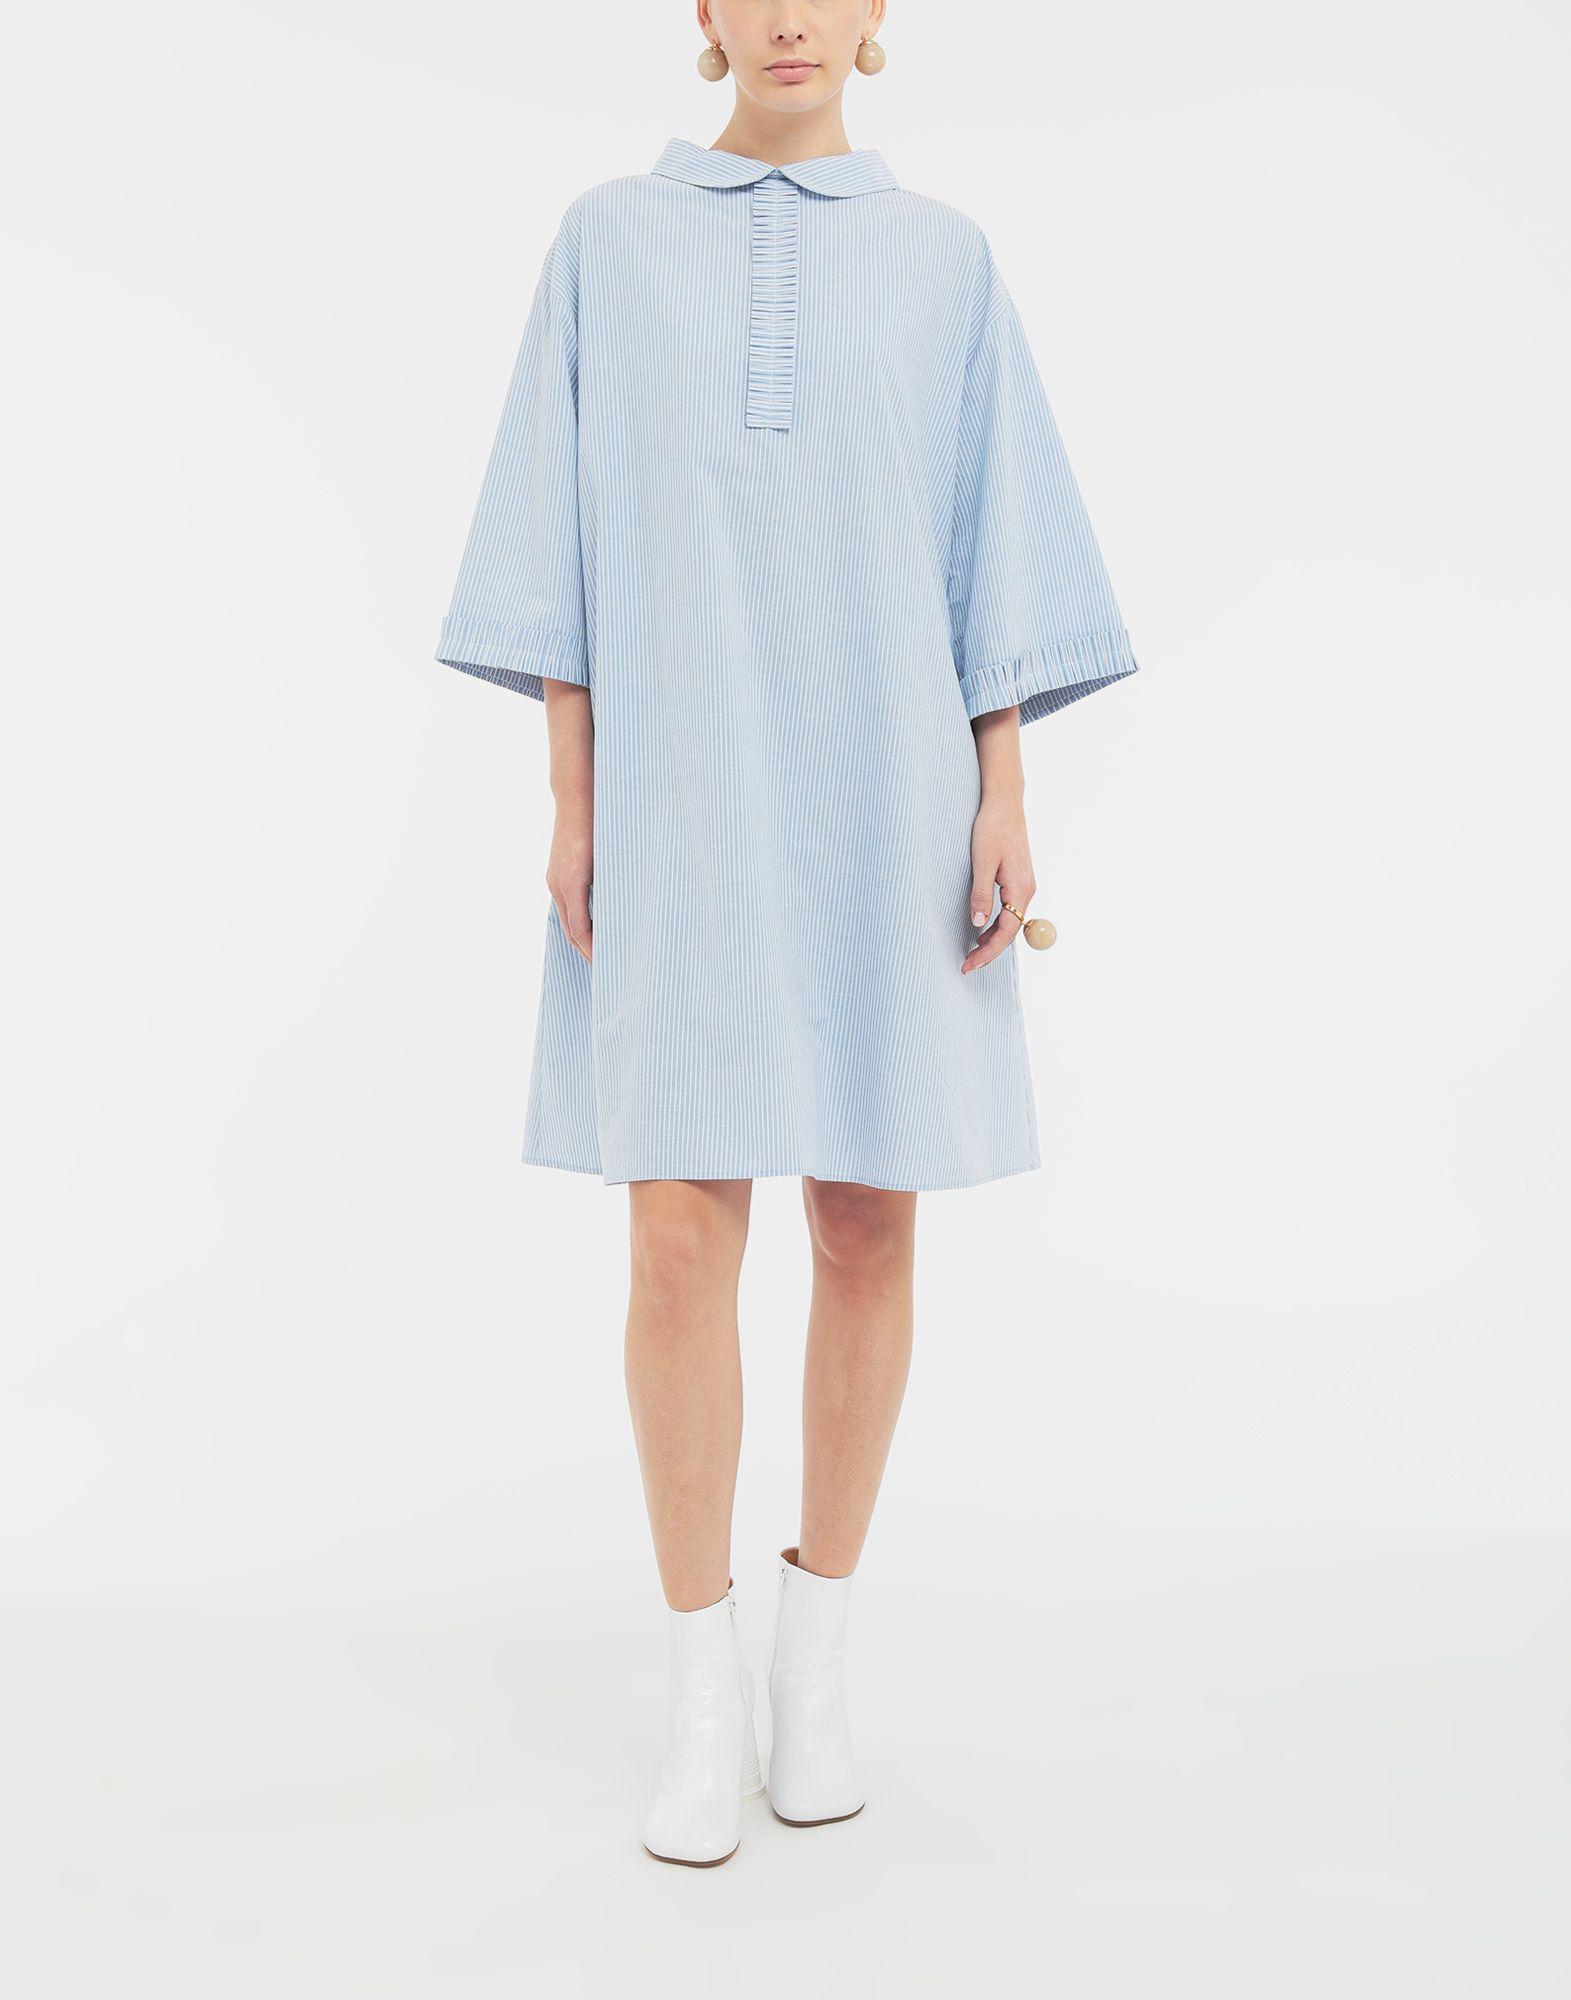 MM6 MAISON MARGIELA School uniform midi shirt dress 3/4 length dress Woman d